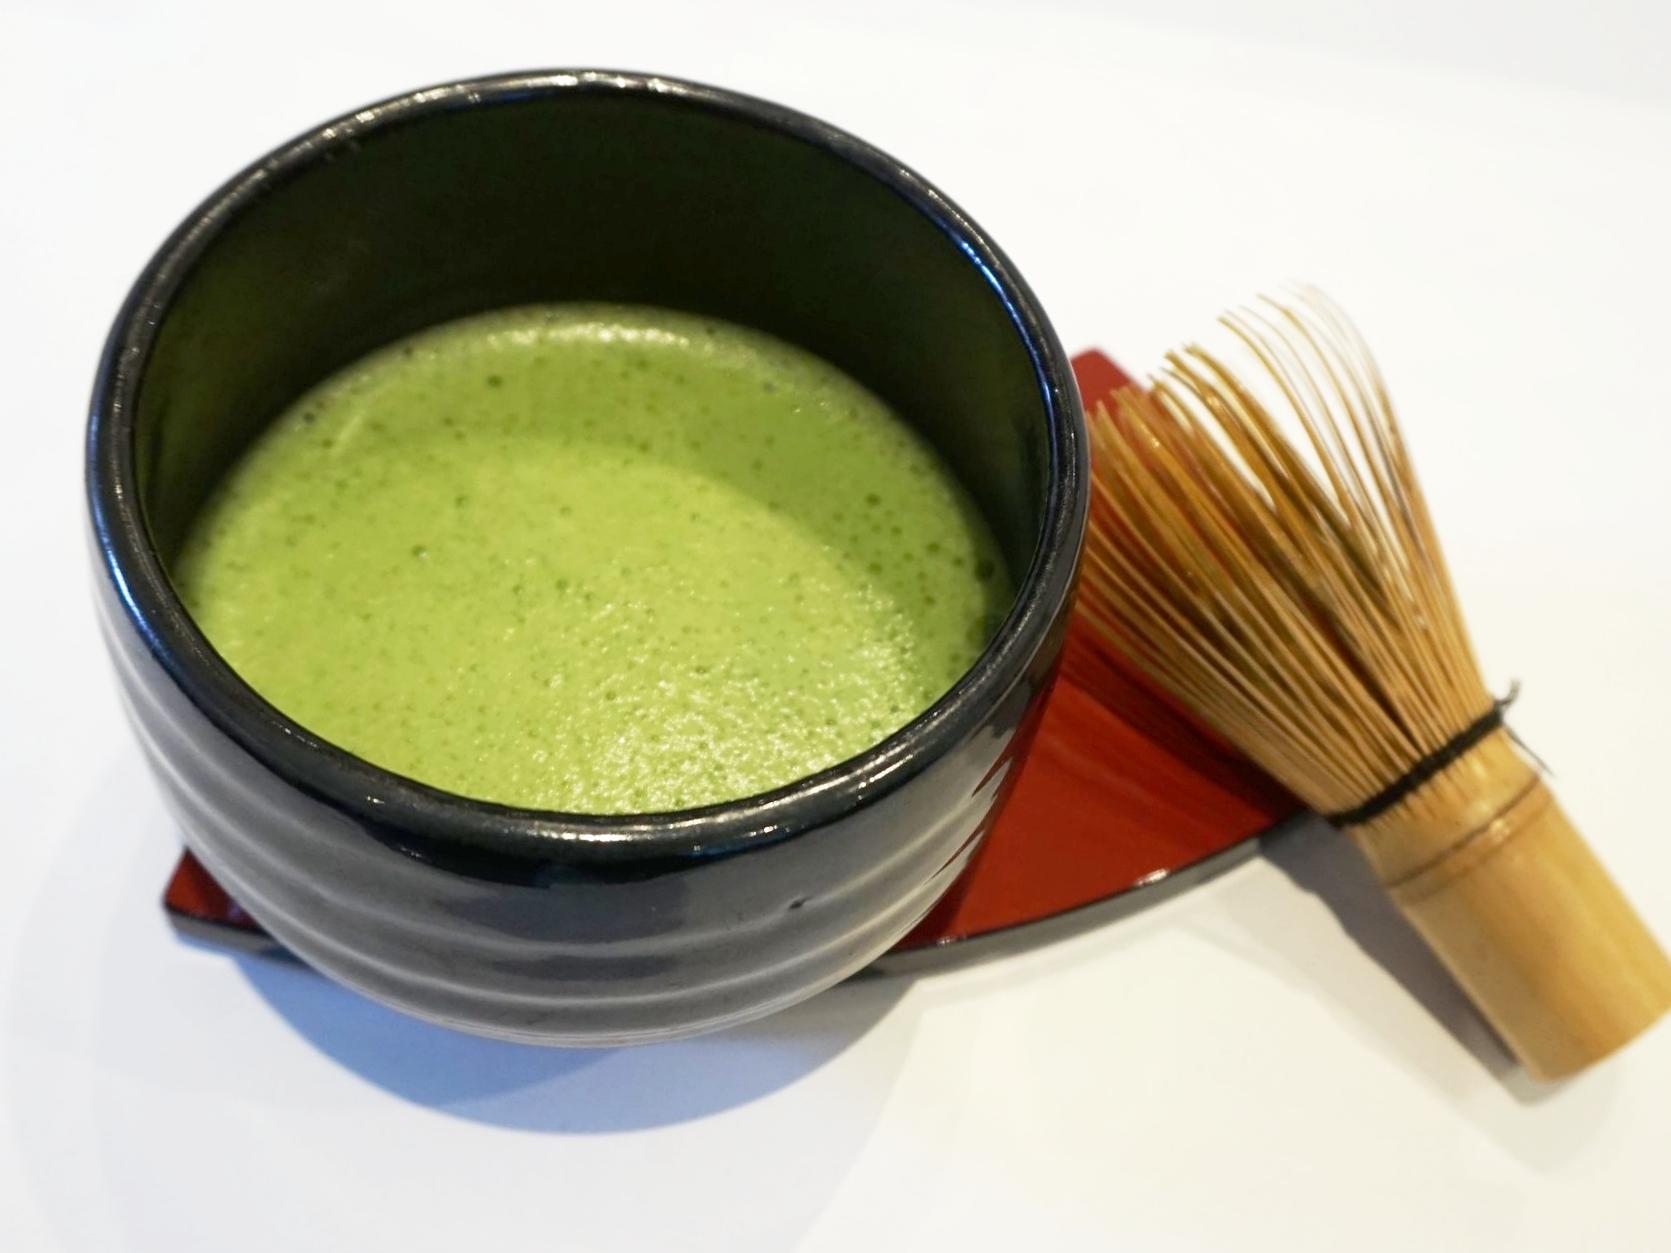 Matcha green tea tasting workshop at Gusta Cooking Studio